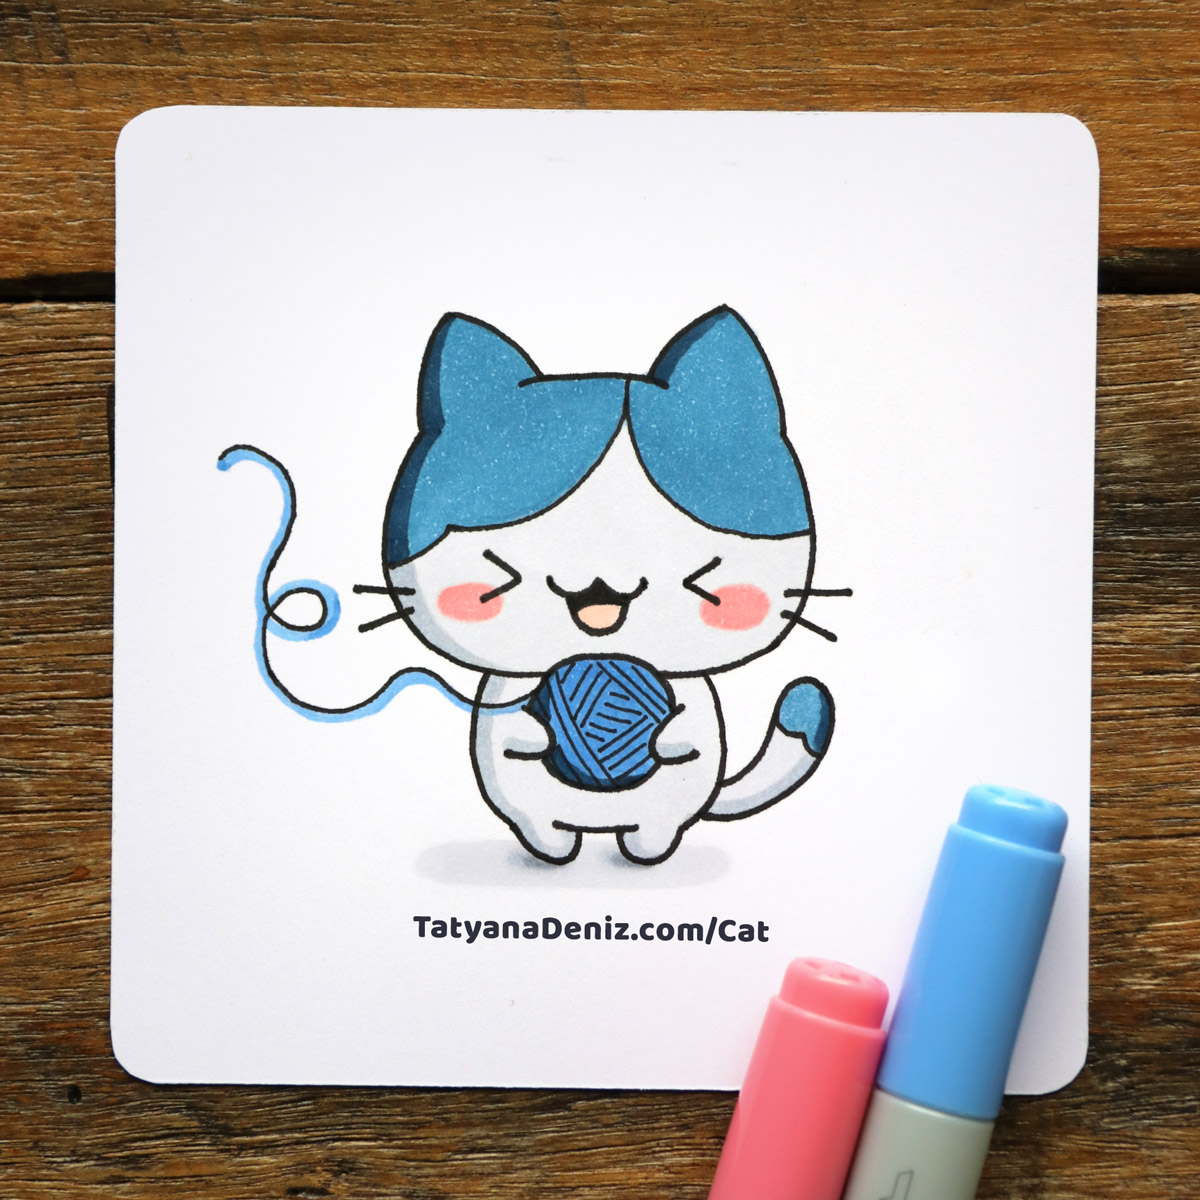 Kawaii Cat Step-by-step Drawing Tutorial